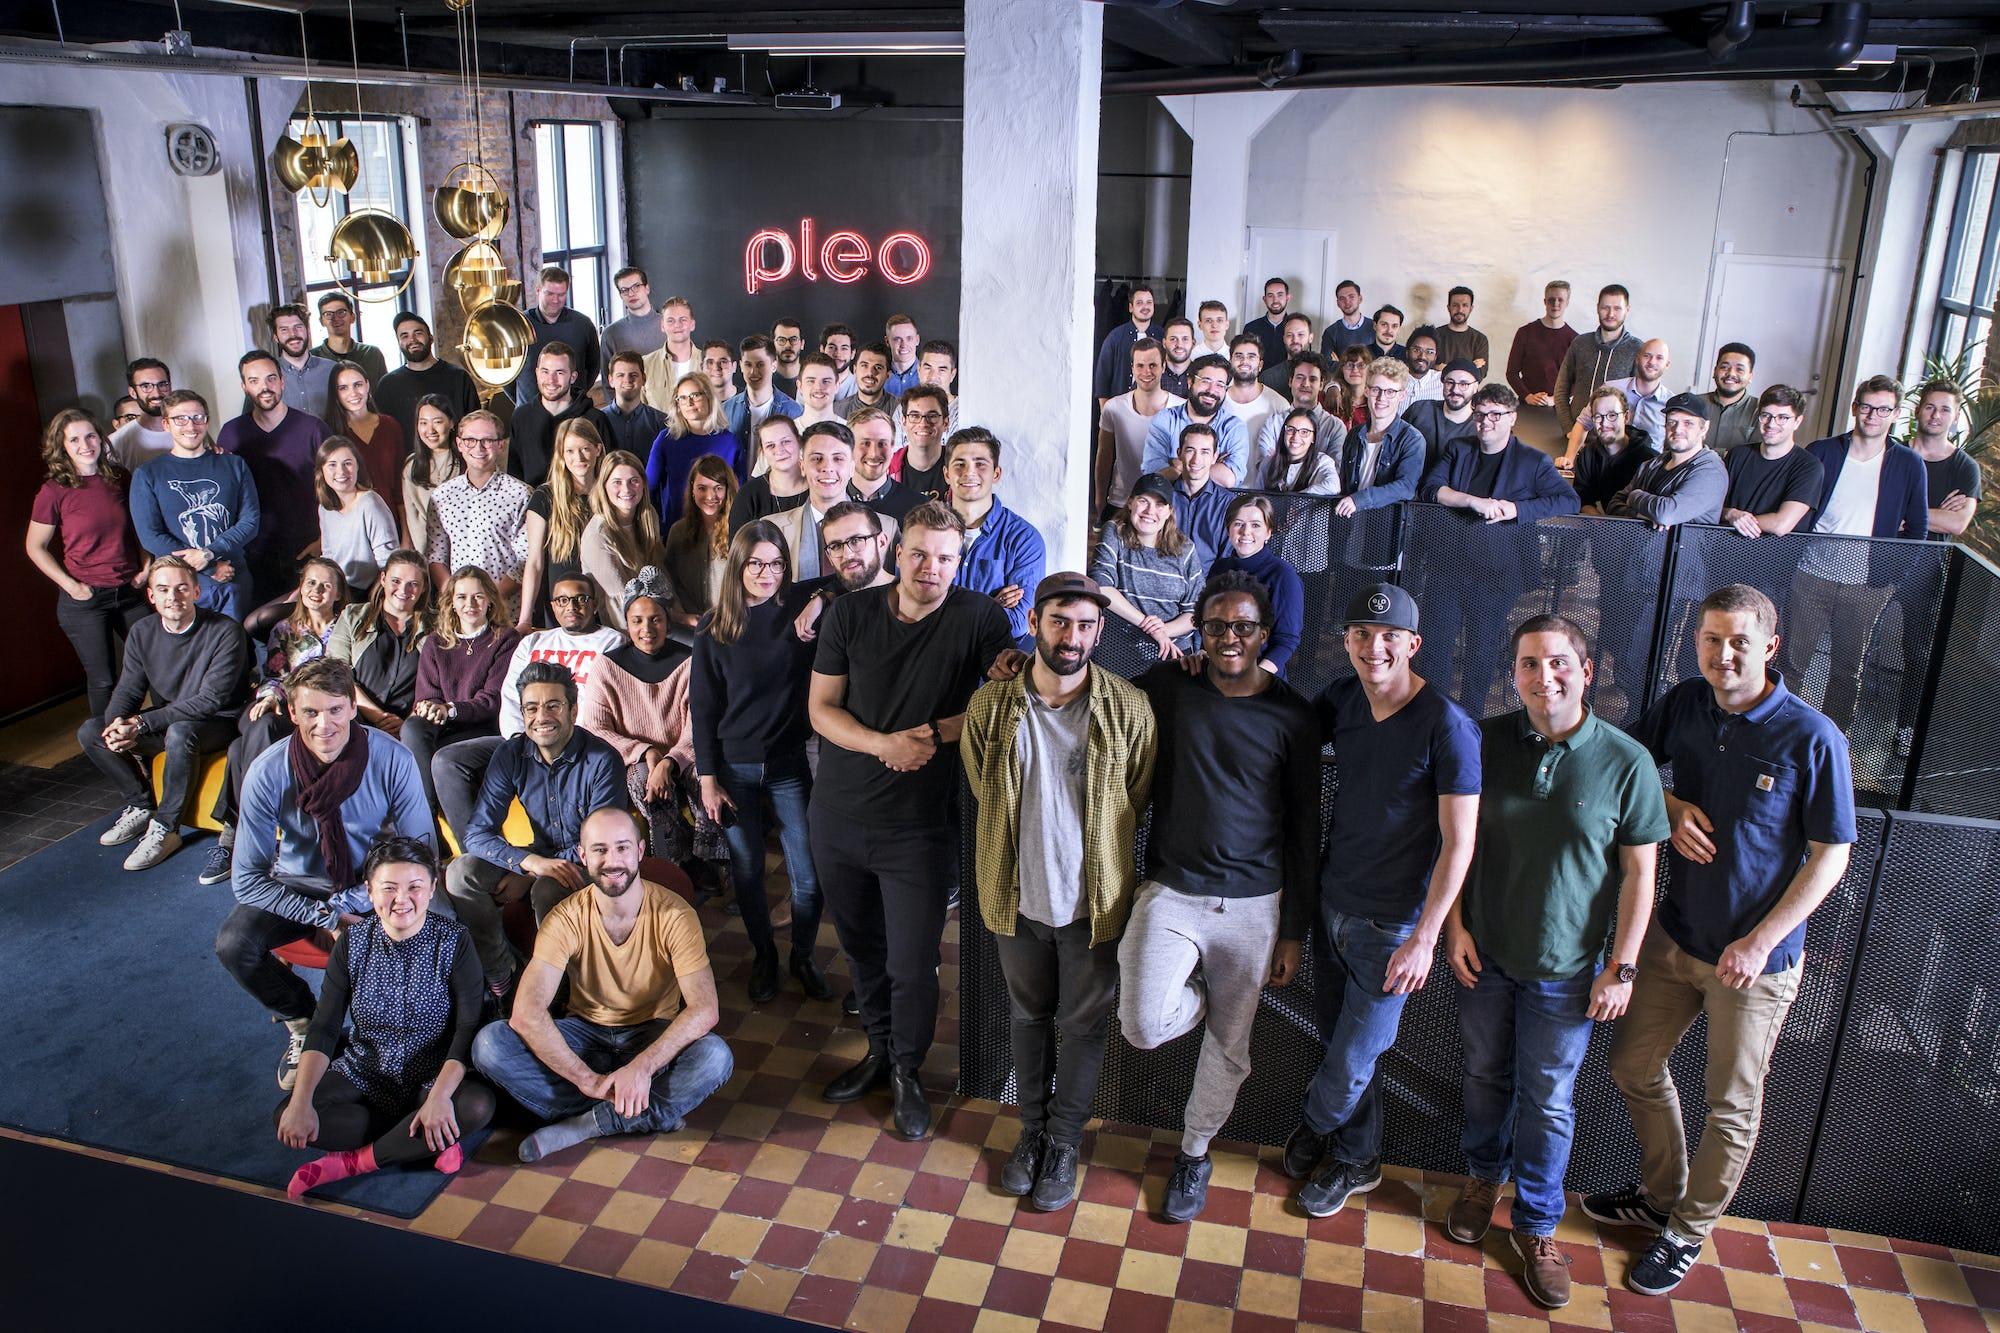 Pleo_team-lowres